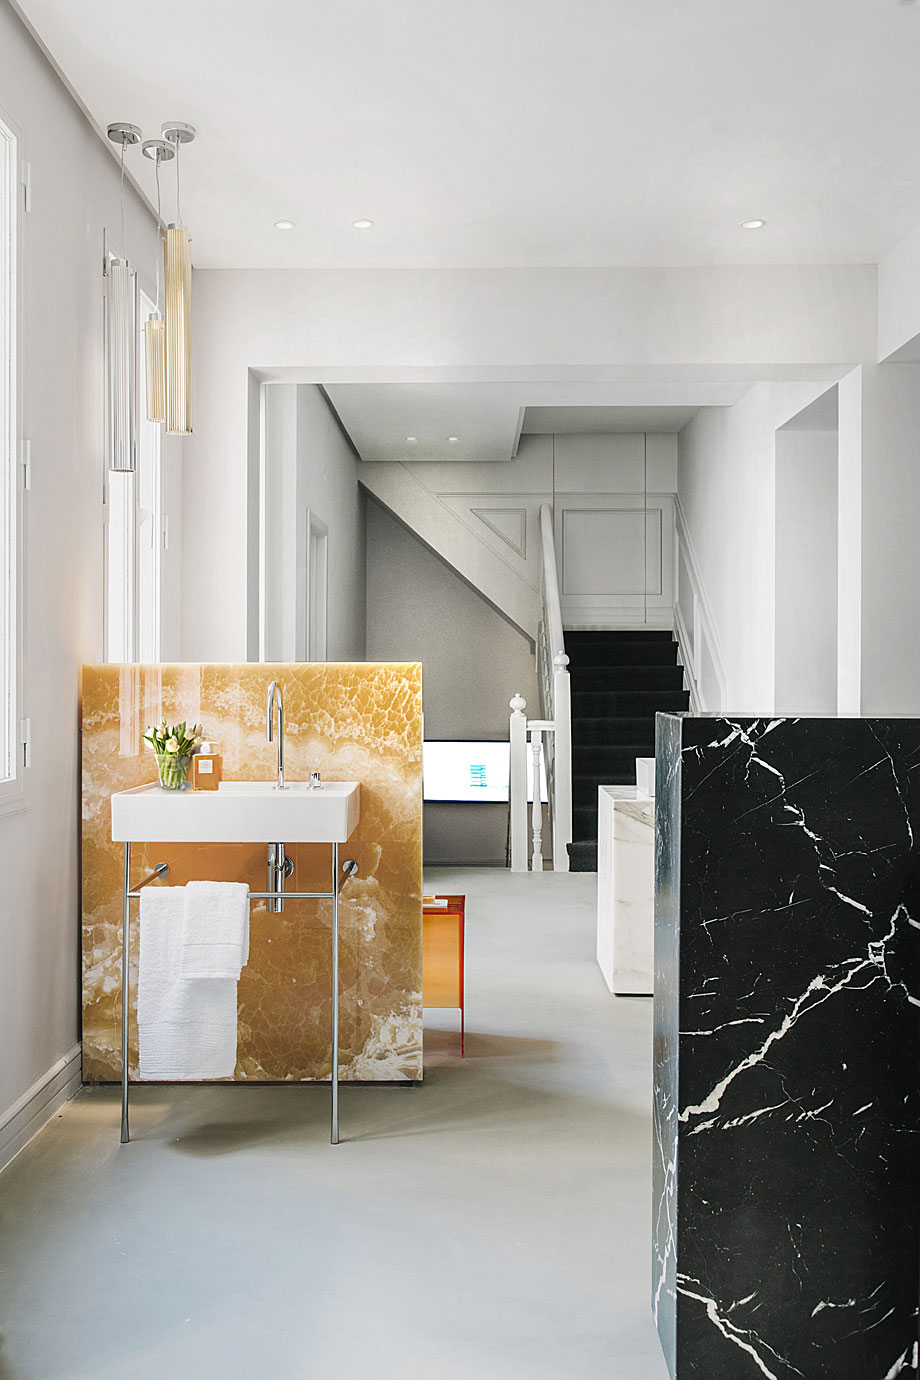 laufen-showroom-baños-madrid-patricia-urquiola (8)